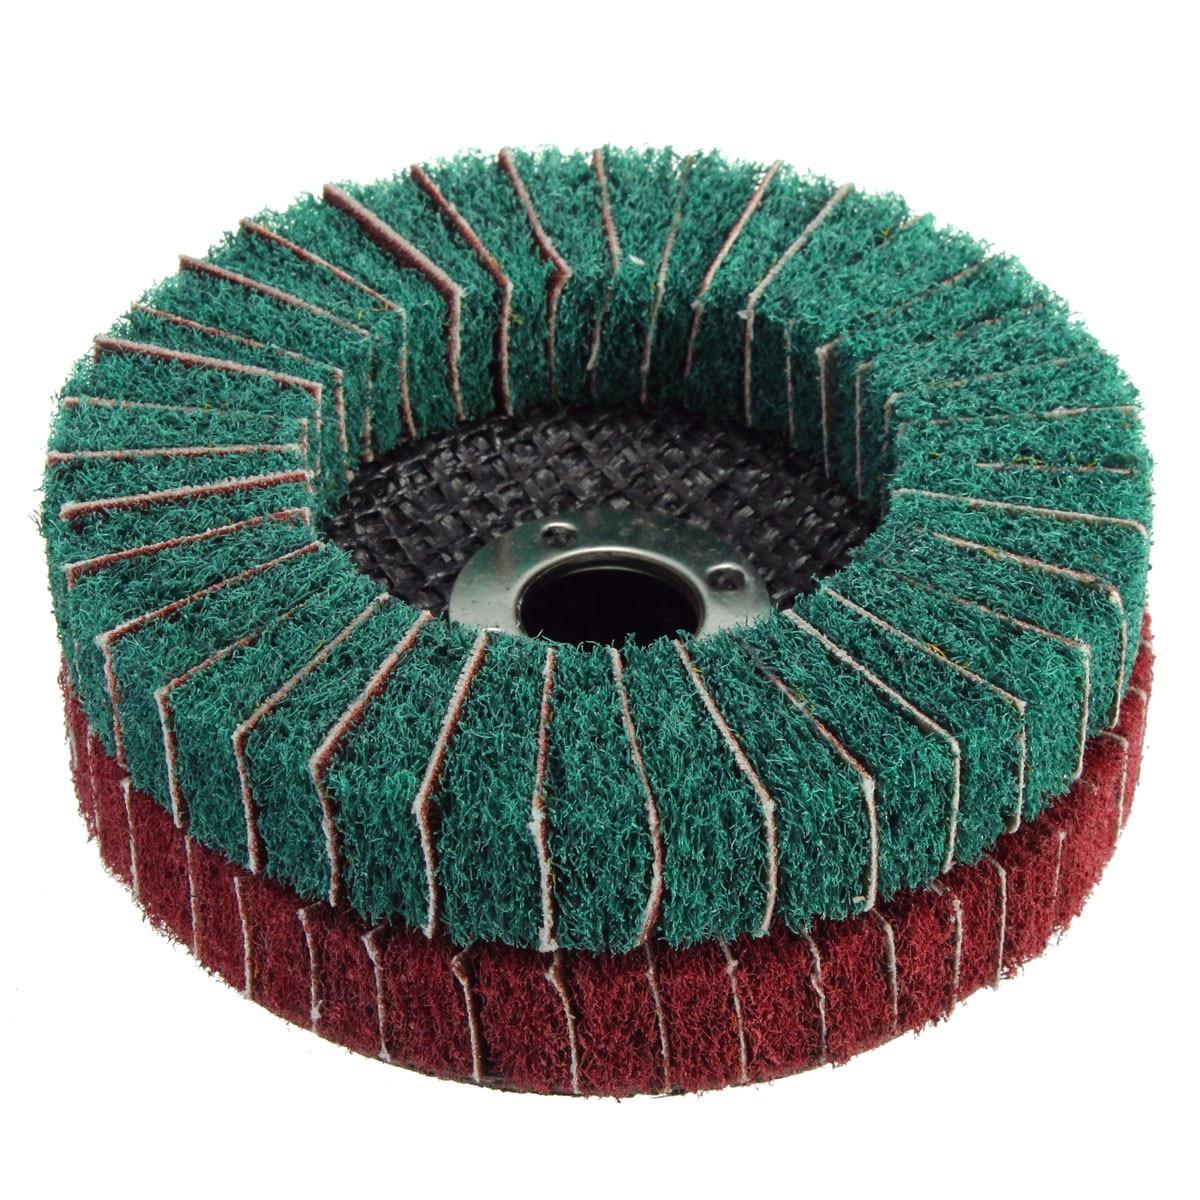 180 Grit Nylon Fiber Flap Wheel Disc 100mm x 16mm Abrasive Polishing Buffing Pad